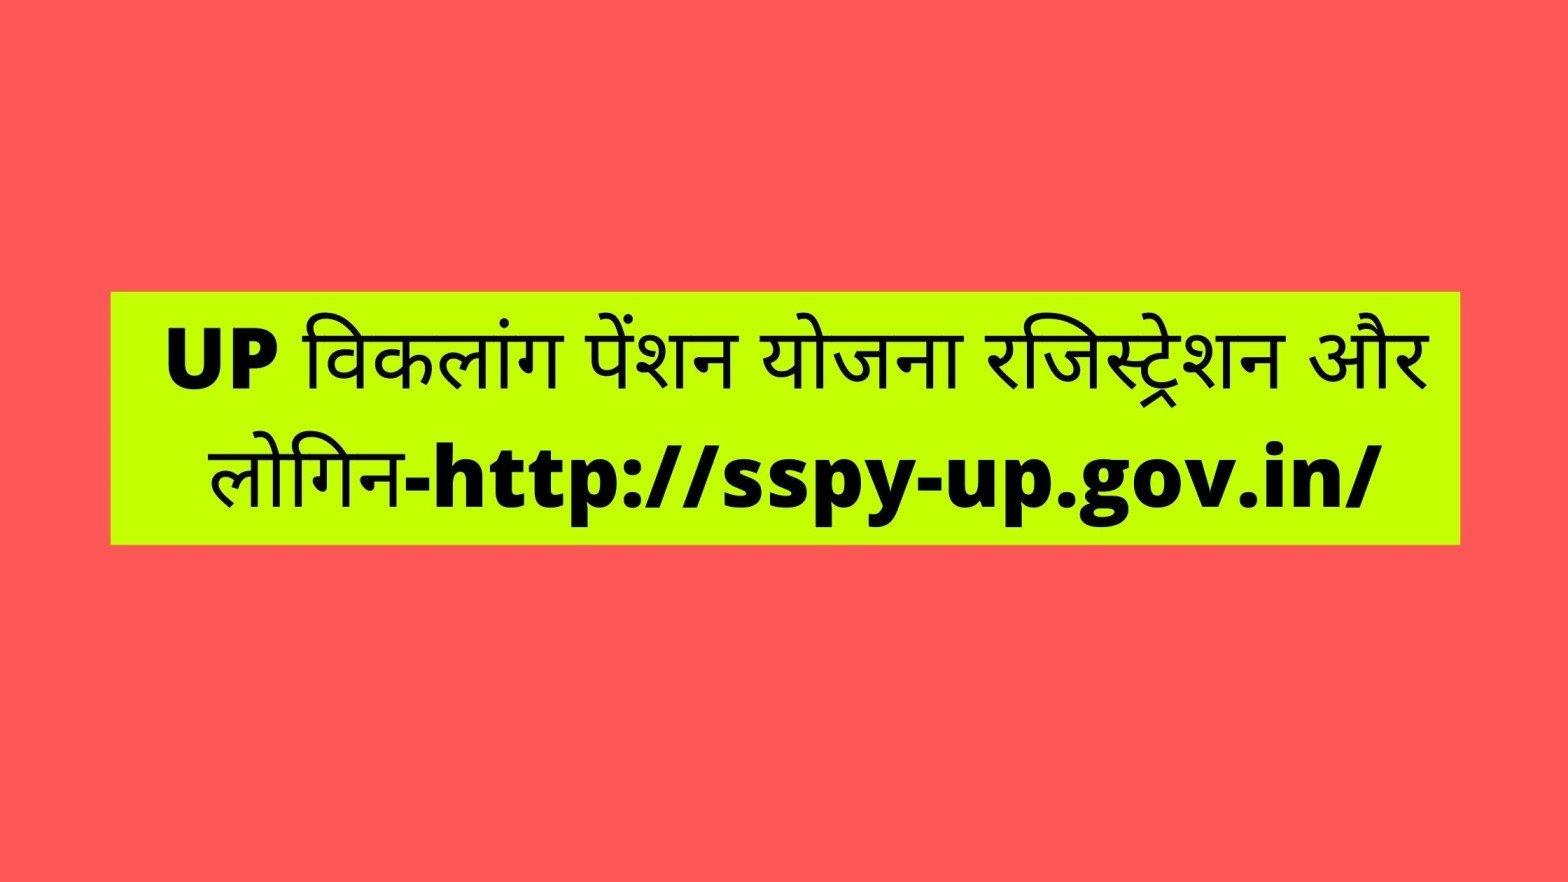 UP विकलांग पेंशन योजना रजिस्ट्रेशन और लोगिन-http://sspy-up.gov.in/